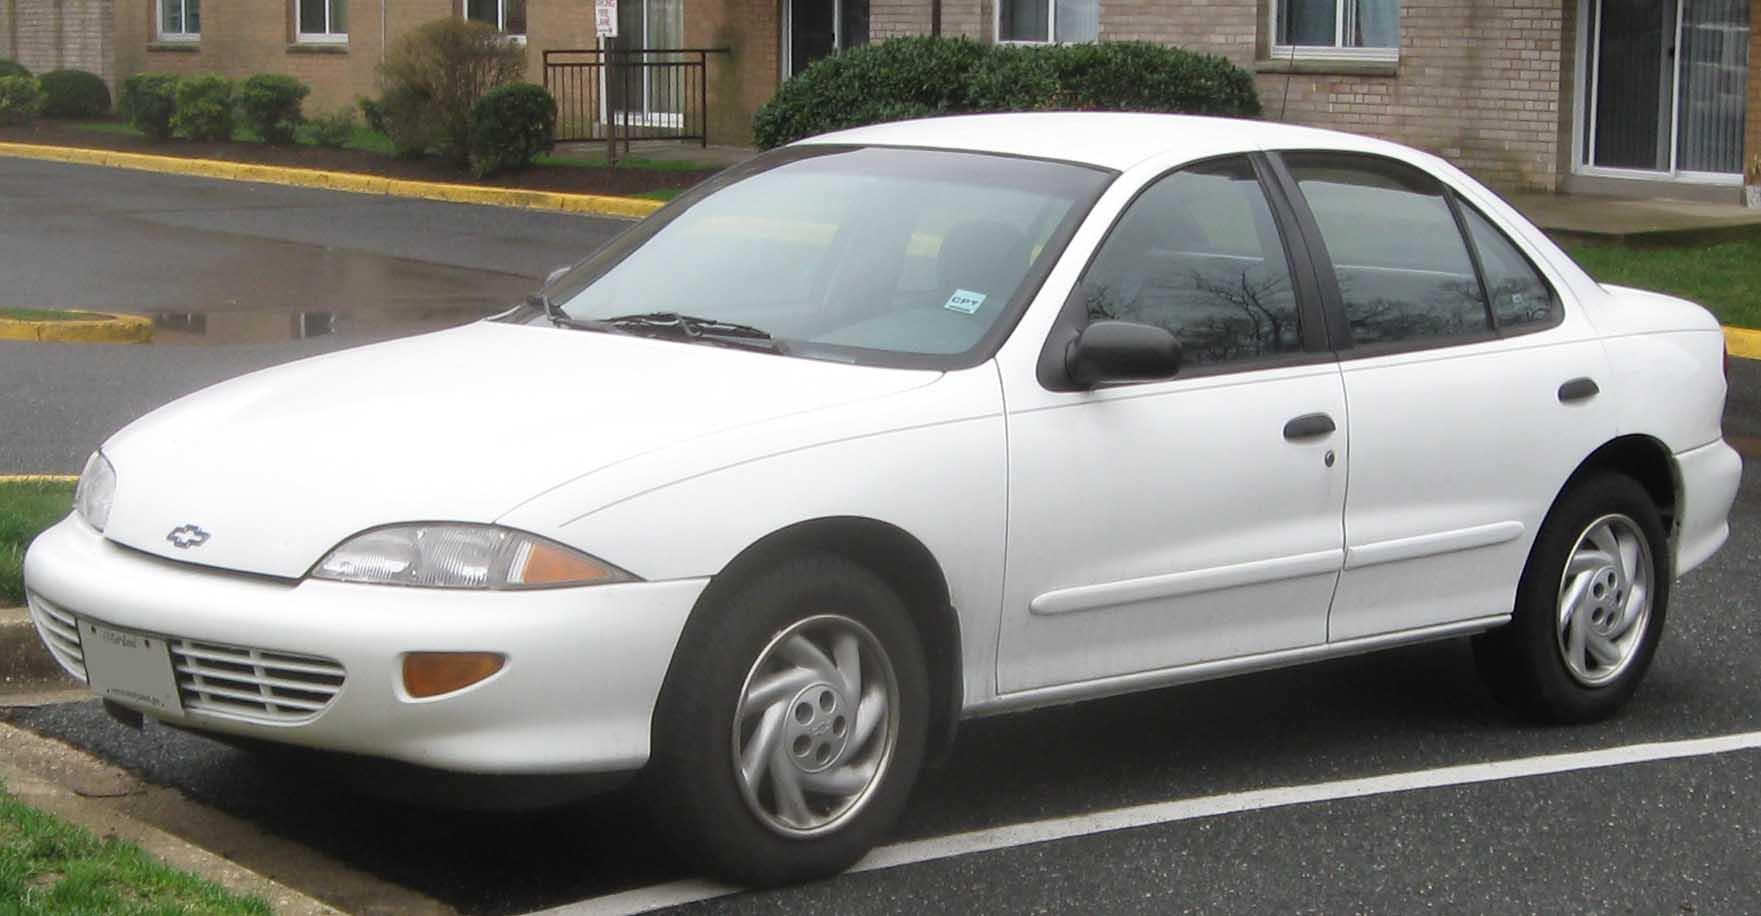 Chevrolet Cavalier 2007 foto - 3